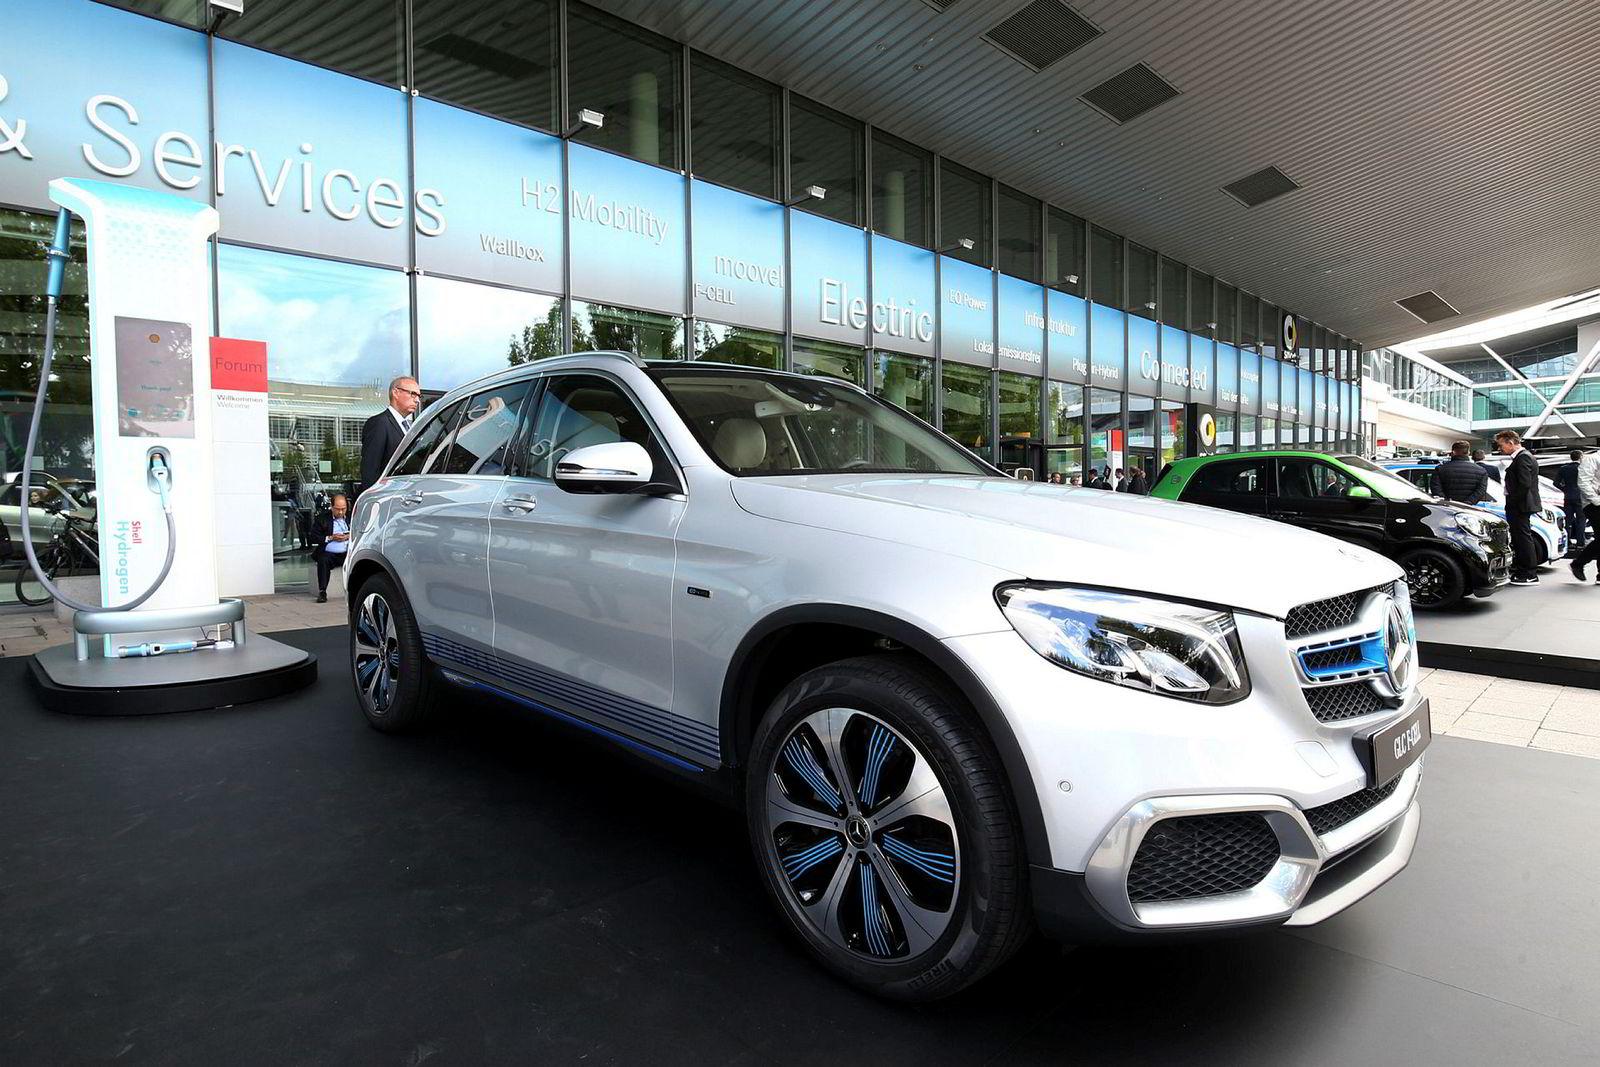 Den eneste hydrogen-modellen DN fant i Frankfurt var Mercedes-Benz GLC Fuel Cell som er en ladbar hydrogen-hybrid. Rekkevidden på strøm er 49 kilometer, mens hydrogen bringer den 437 kilometer lenger.